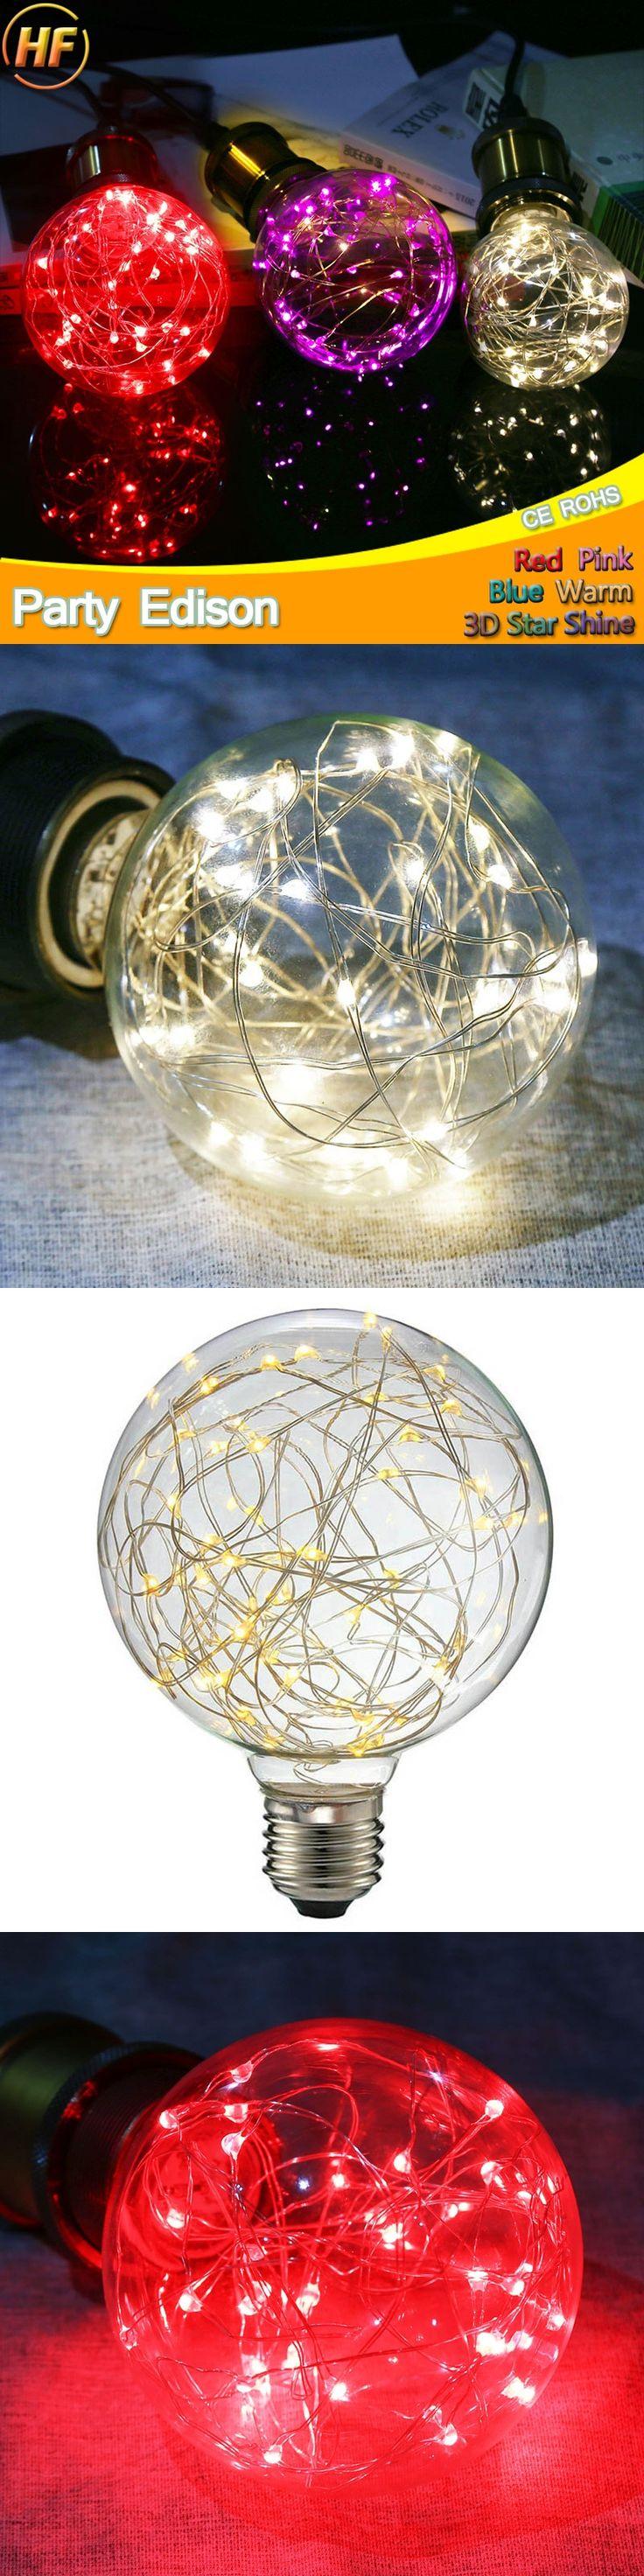 New Design Fairy LED Filament Light E27 G95 Retro Vintage LED Edison Bulb 220V 240V Lampada Ampoule Bombilla Glass Light